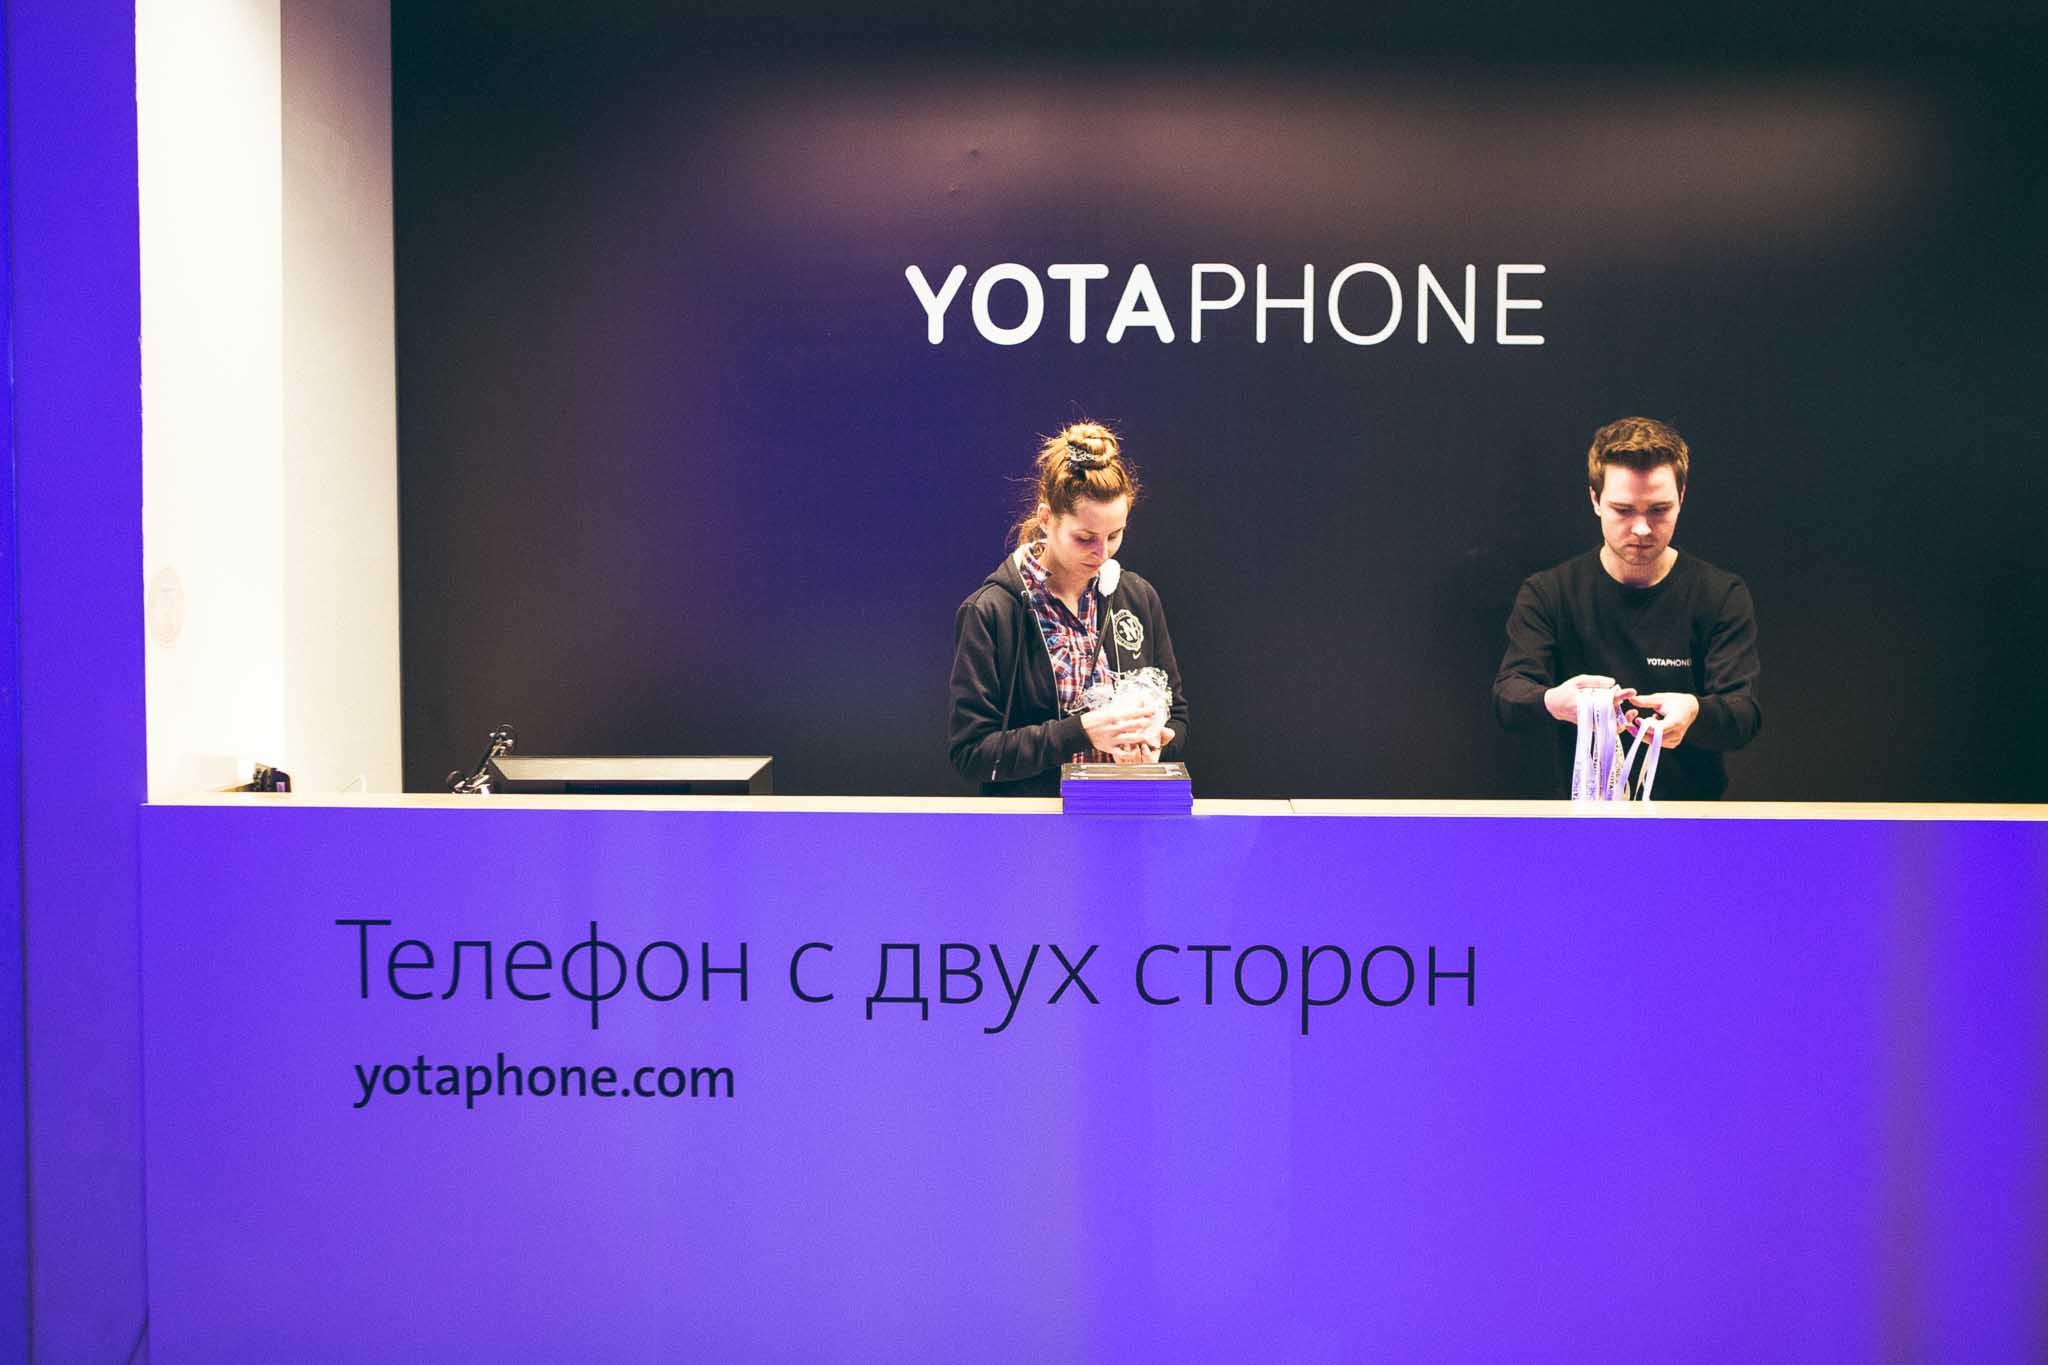 yp_20141202_153857_презентация_Event_yota_yotaphone_Urban_moscow